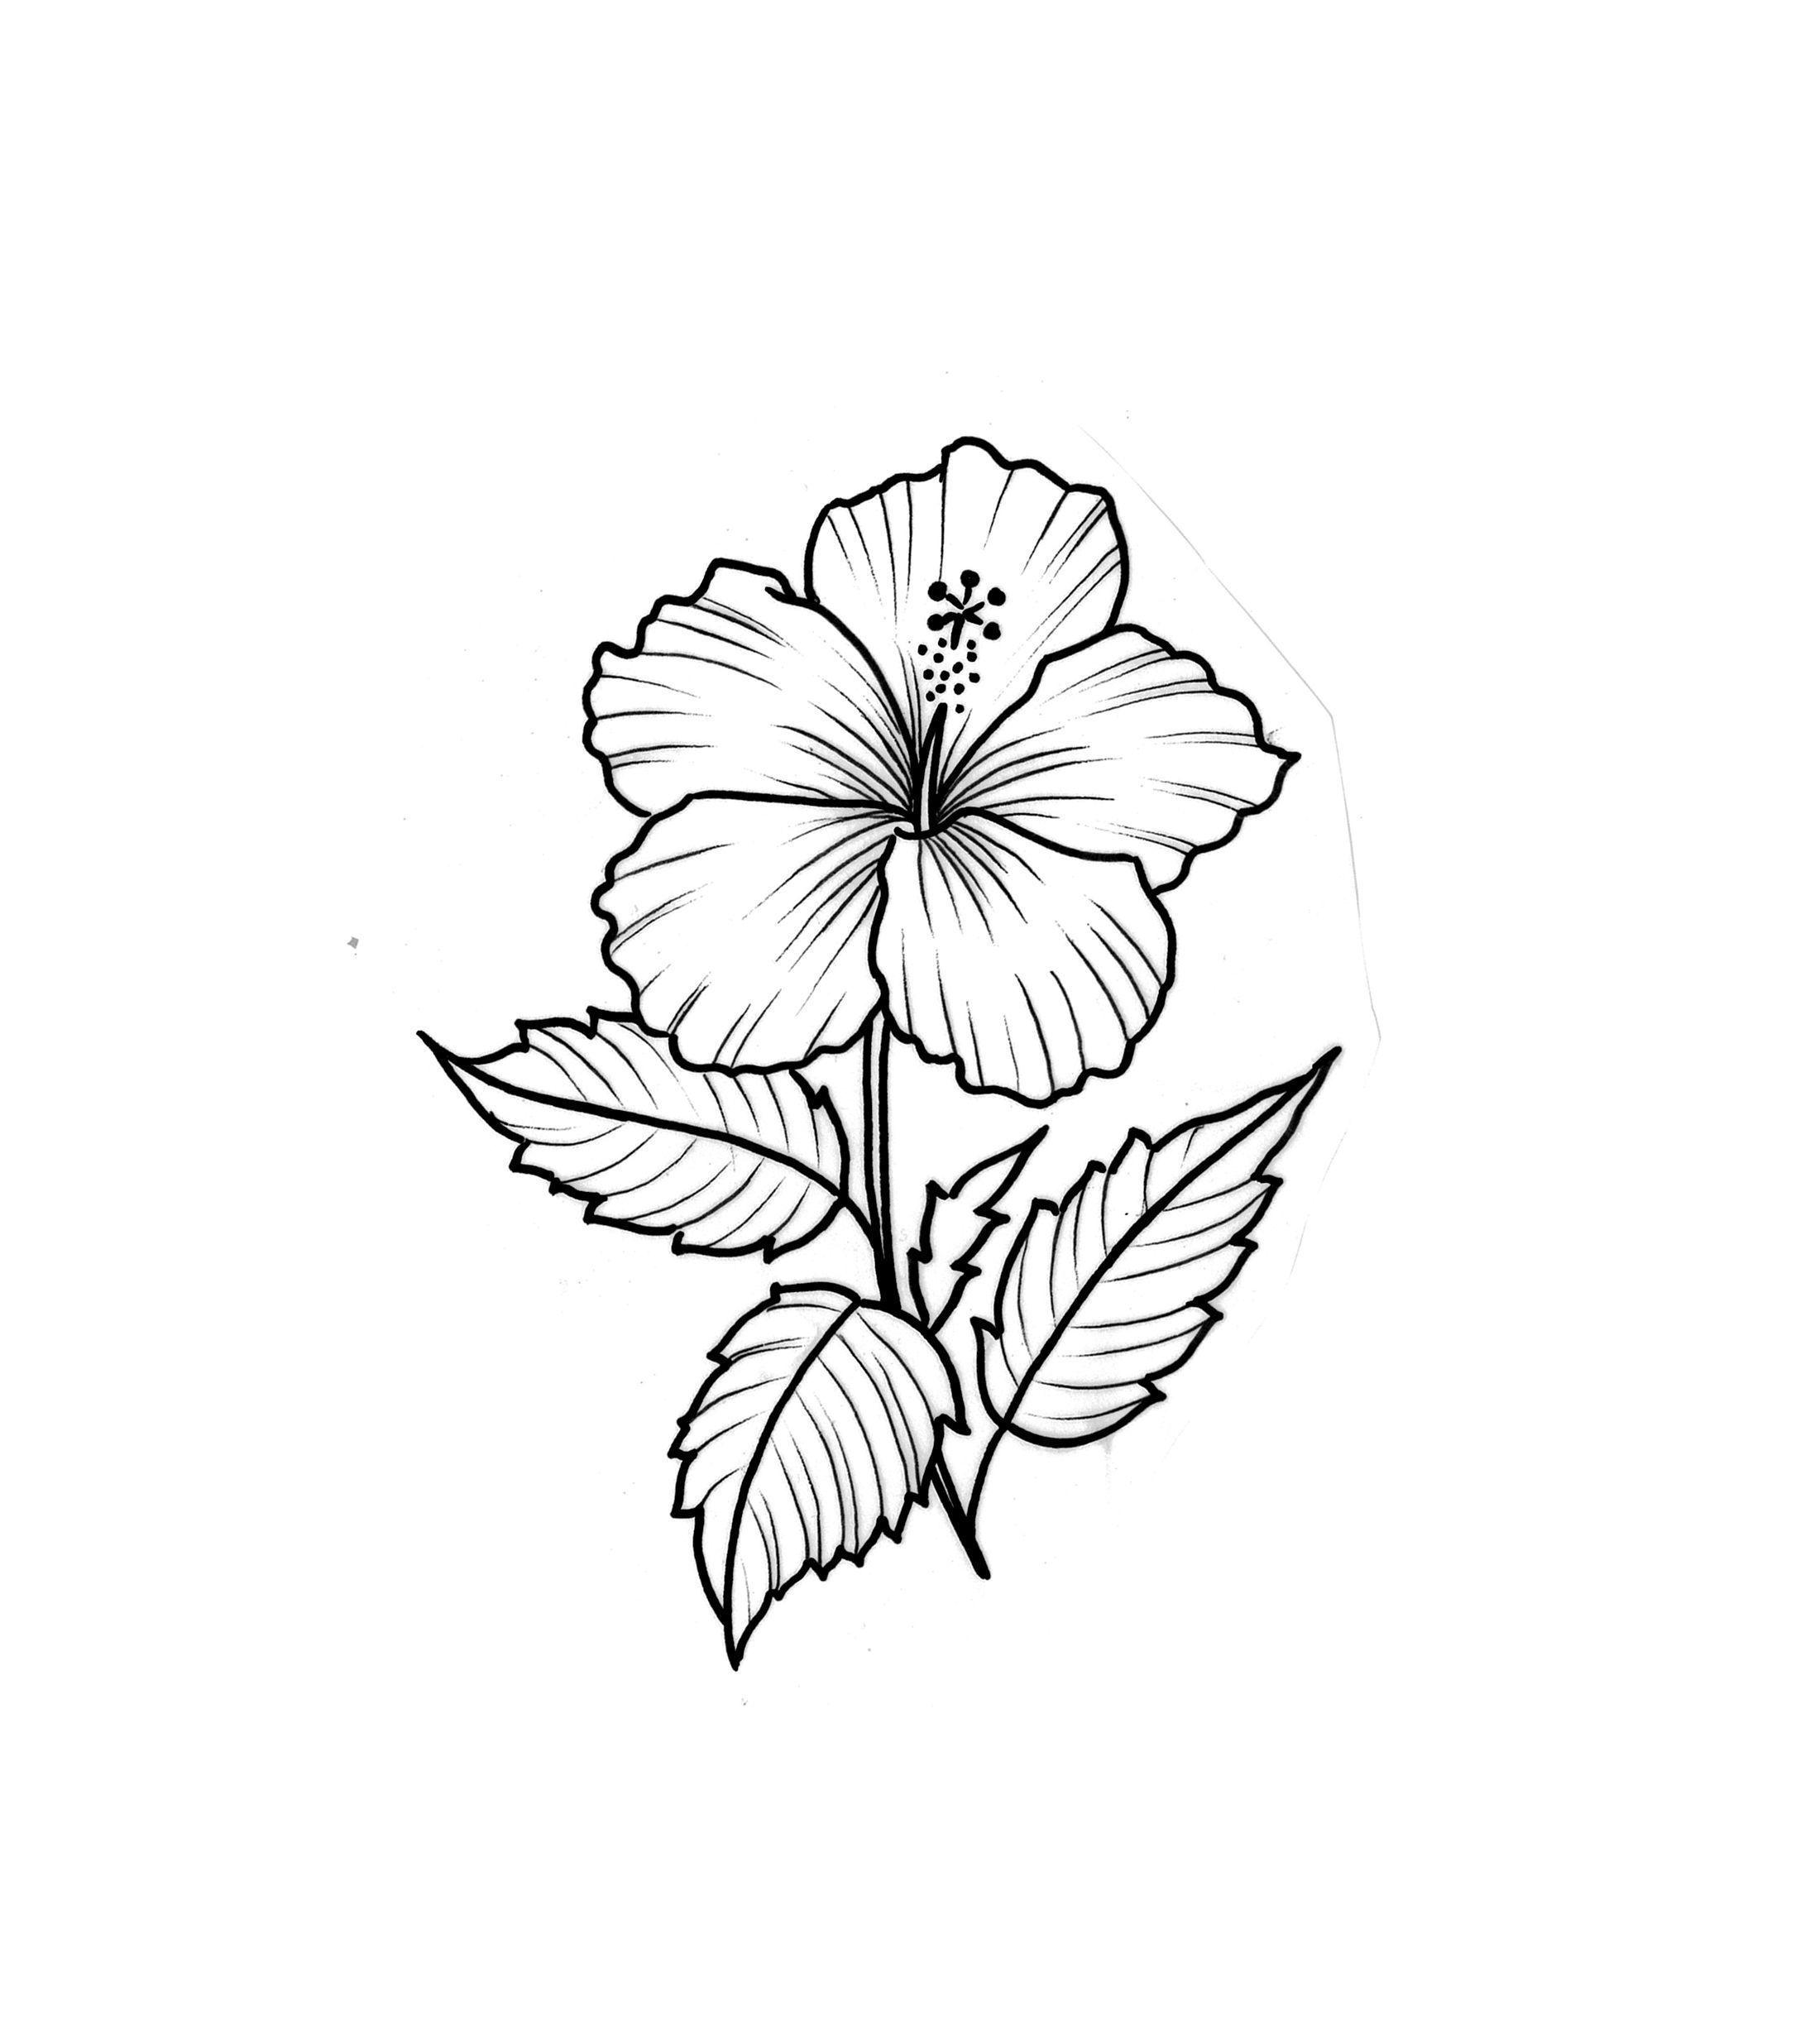 Hibiscus Flower Tattoo Flash Design Design Flash Flower Hibiscus Tattoo Fi Design Flash Flowe In 2020 Hibiscus Flower Tattoos Flower Tattoo Hibiscus Drawing